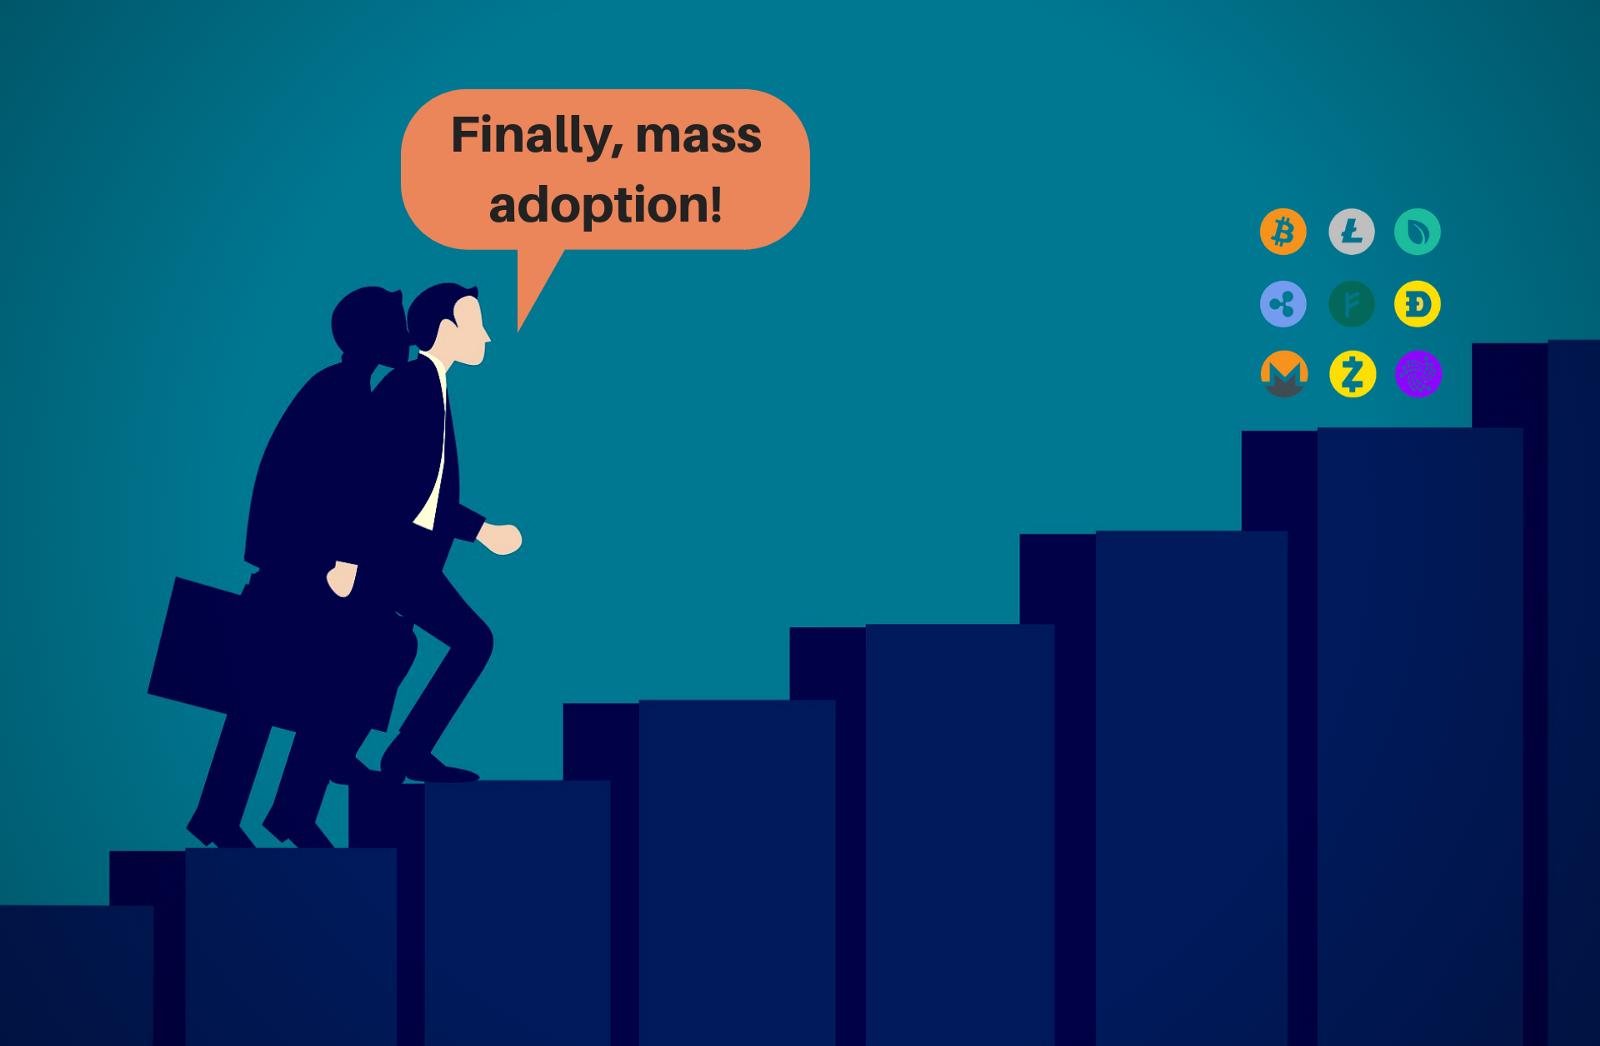 /the-4-steps-to-attain-blockchain-mass-adoption-cc3627c159f2 feature image